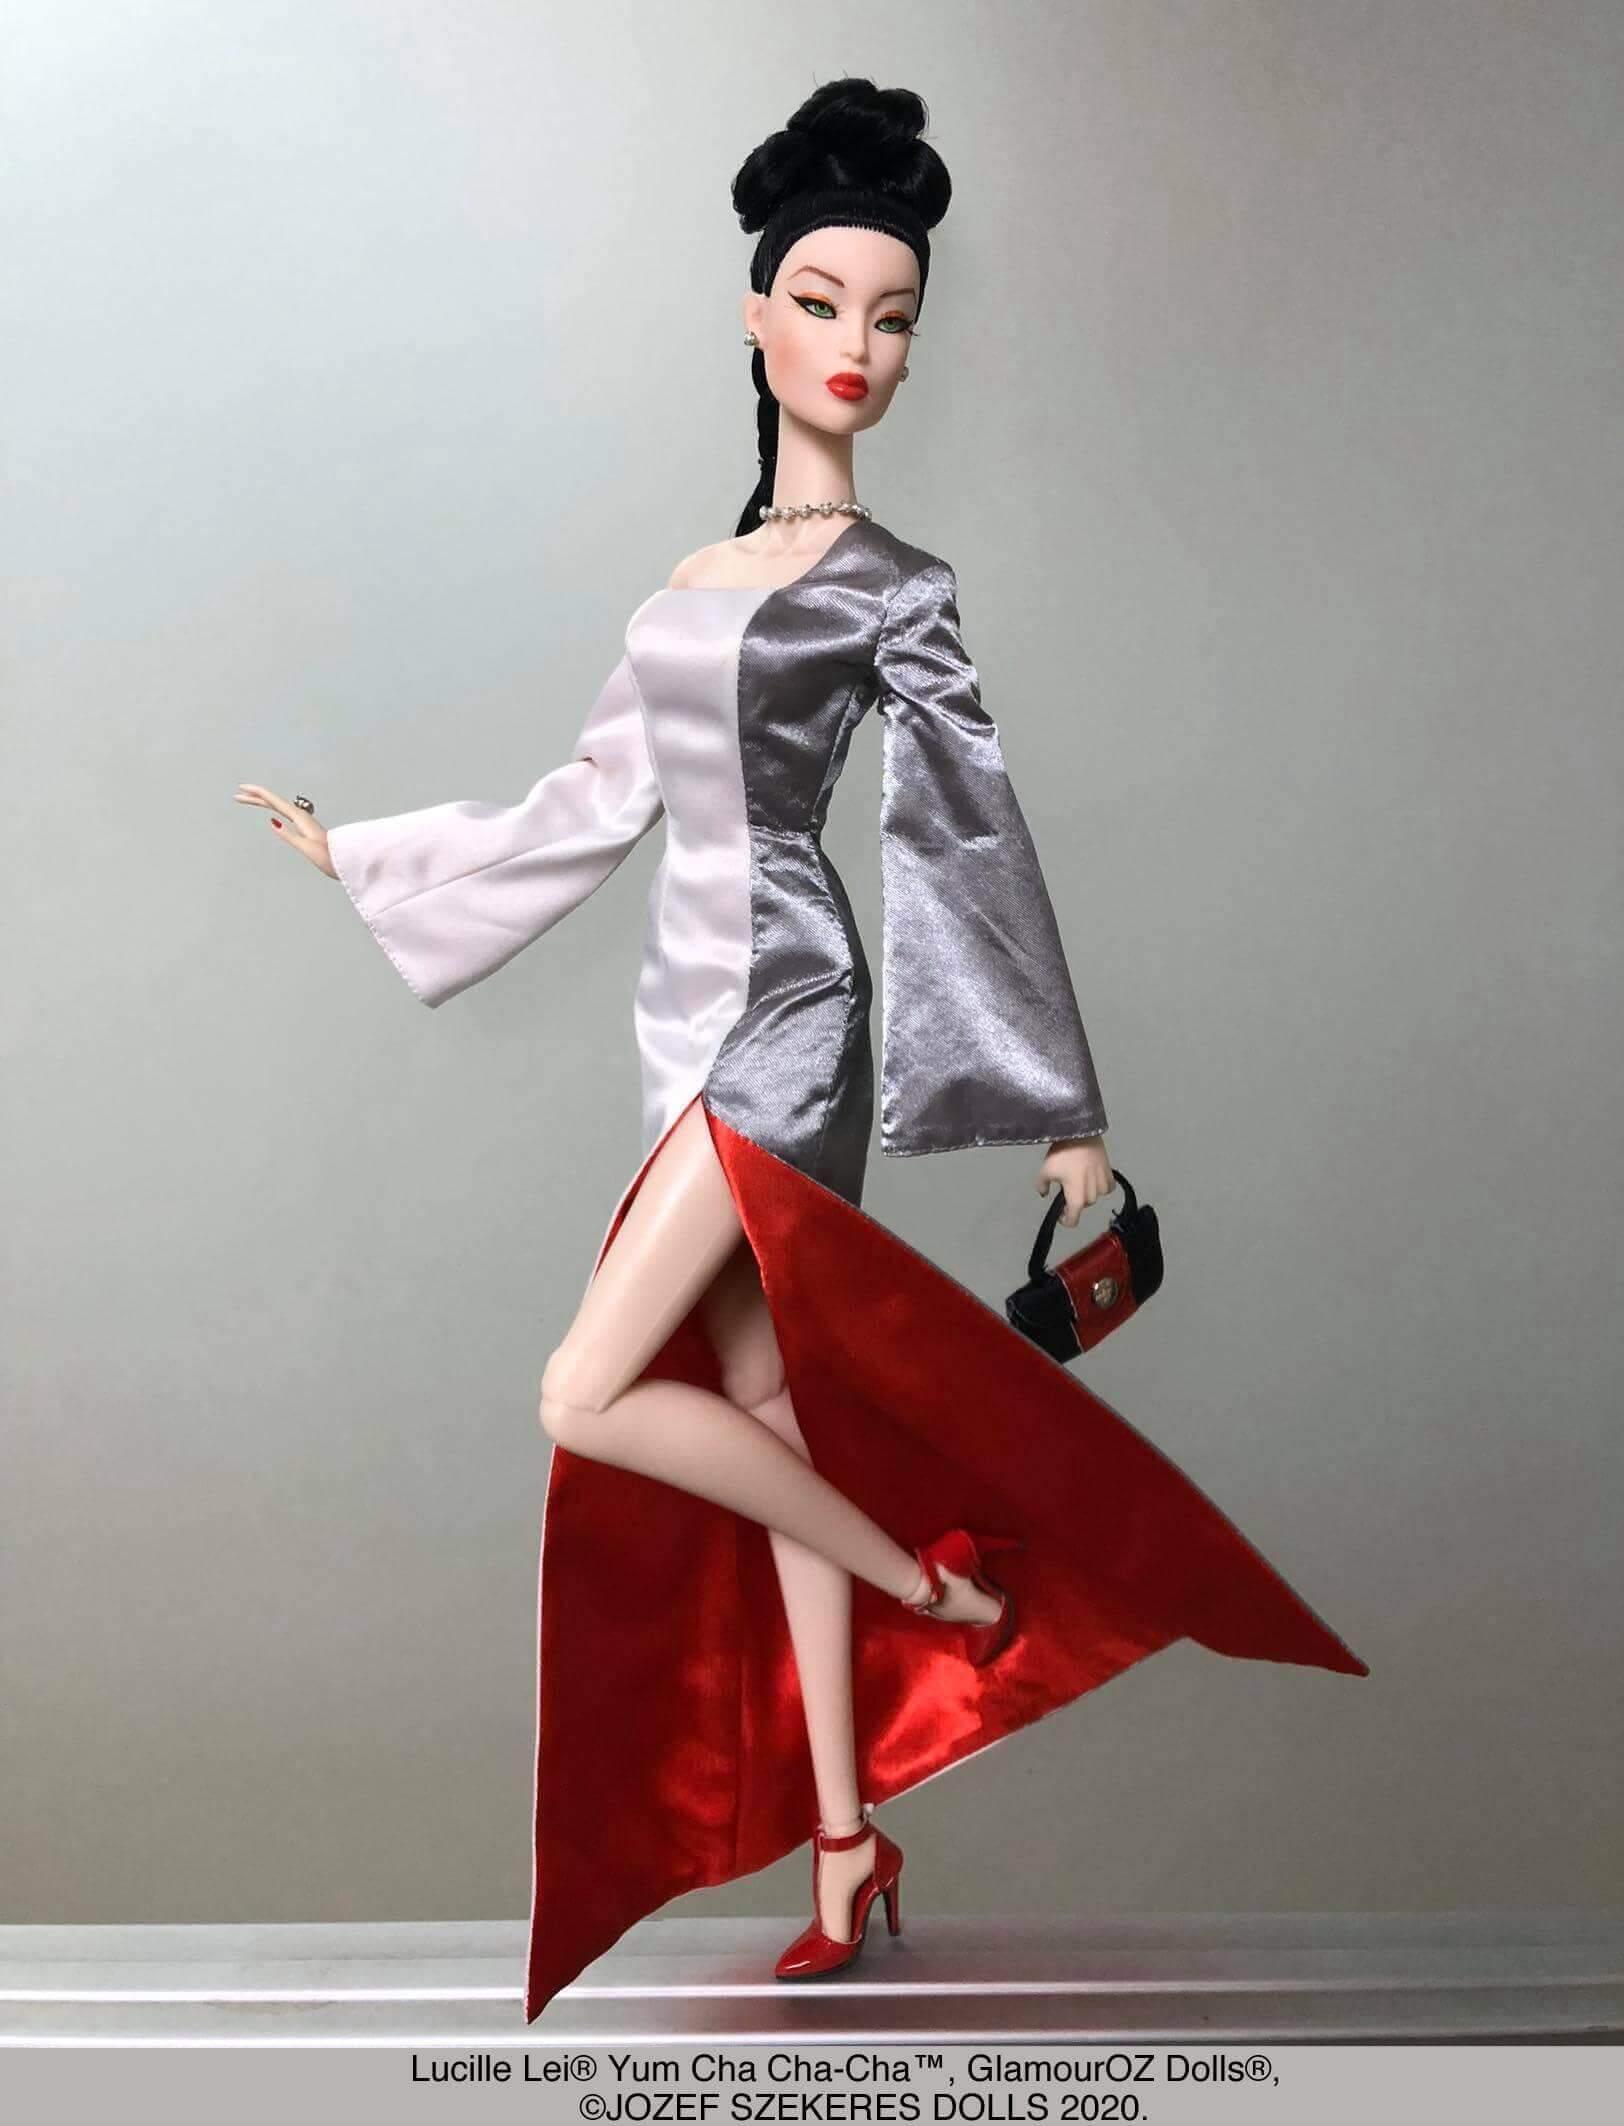 Glamouroz-Lucille-Lei-Yum-Cha-Cha-Cha